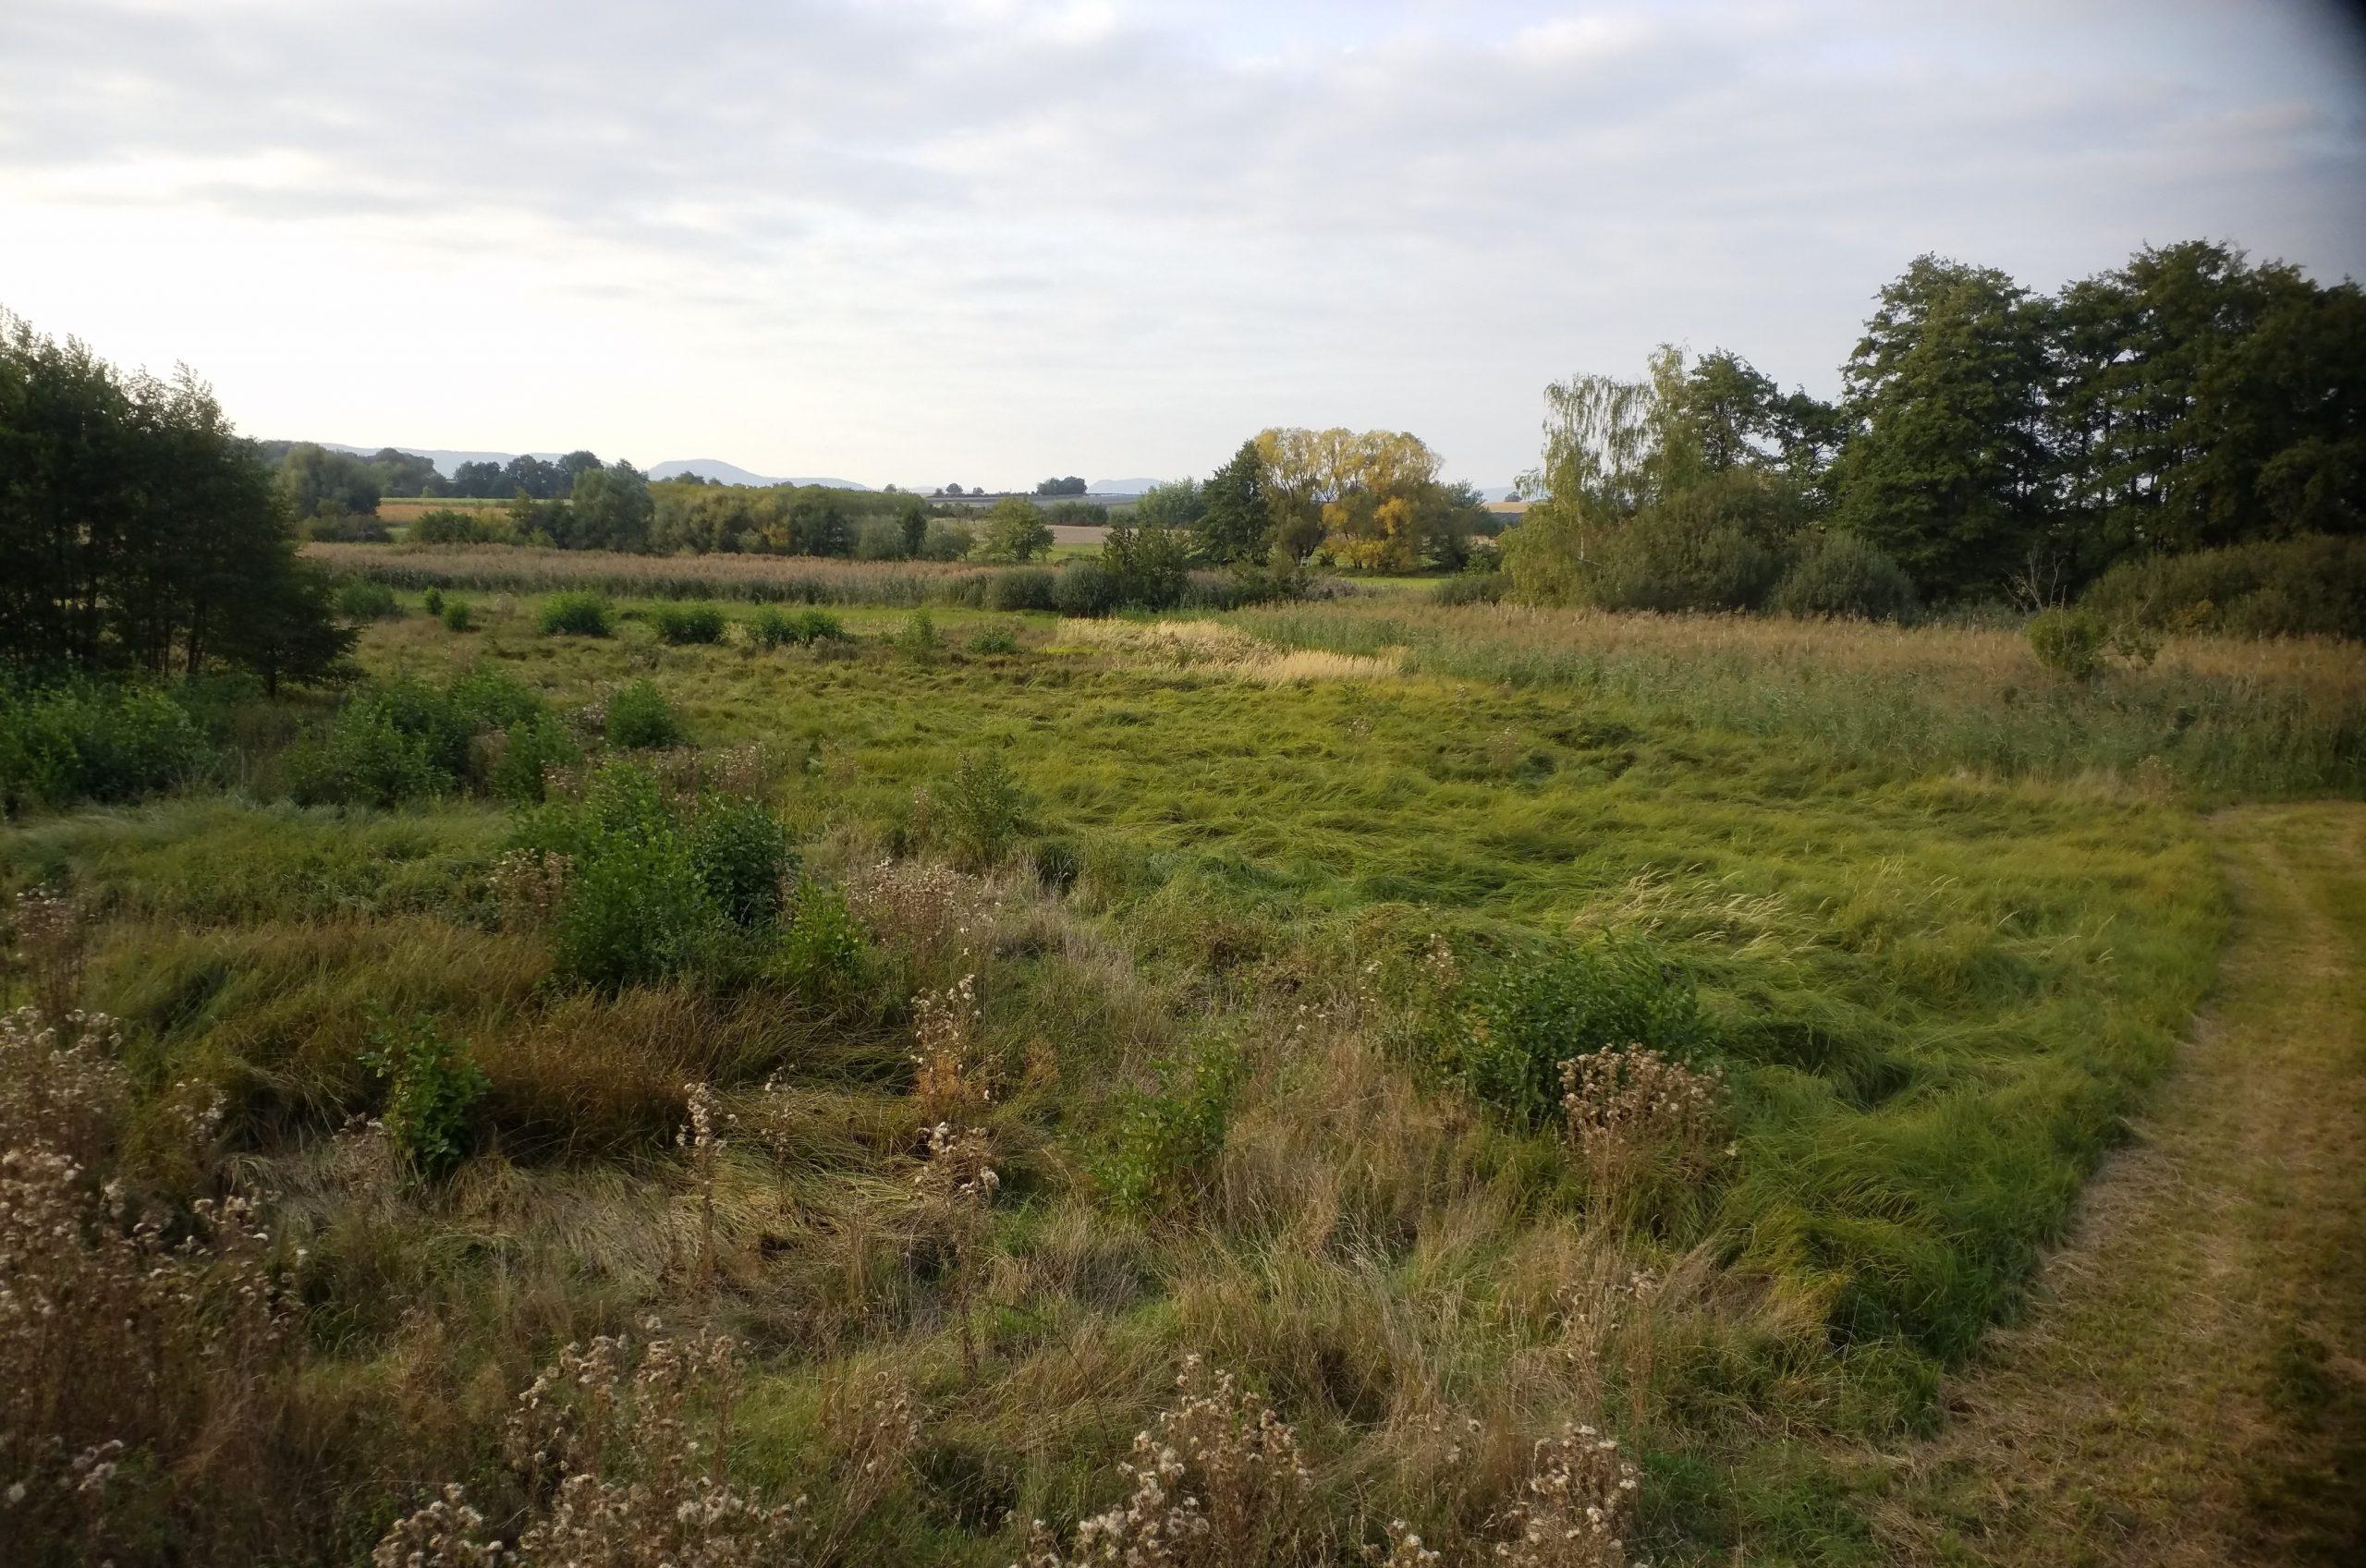 Billigheimer Bruch Moor Wiese